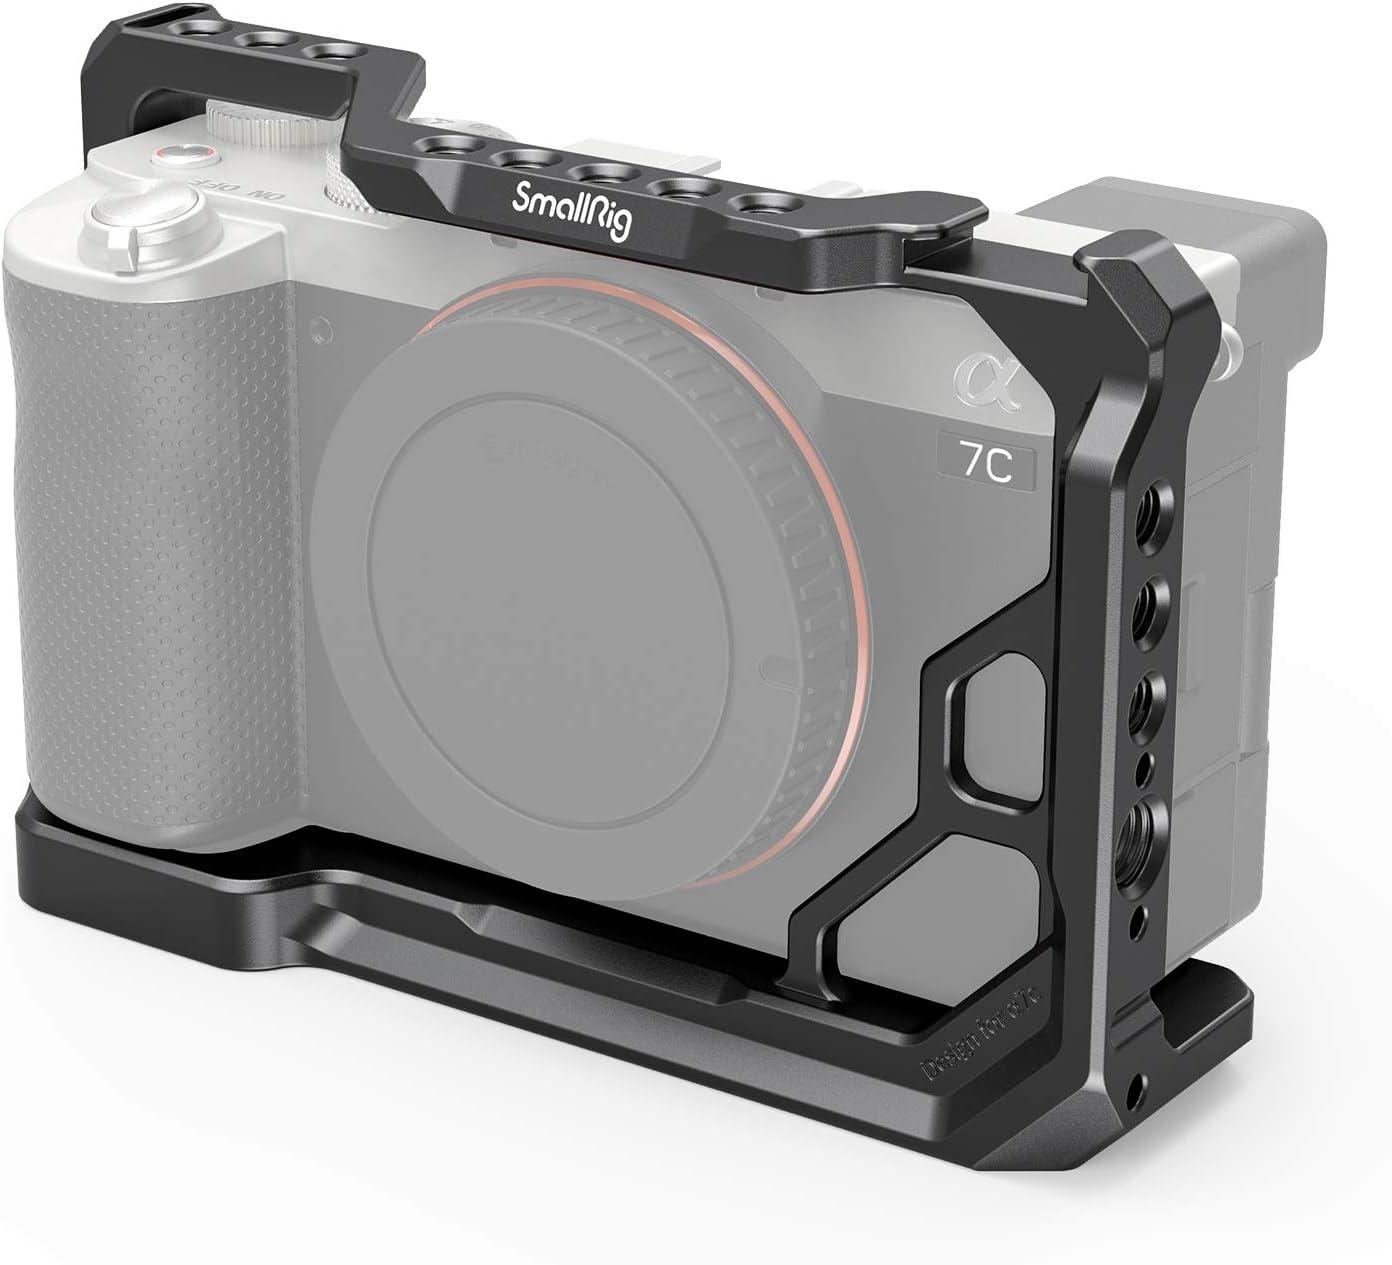 Caja de cámara Sony Alpha 7C A7C